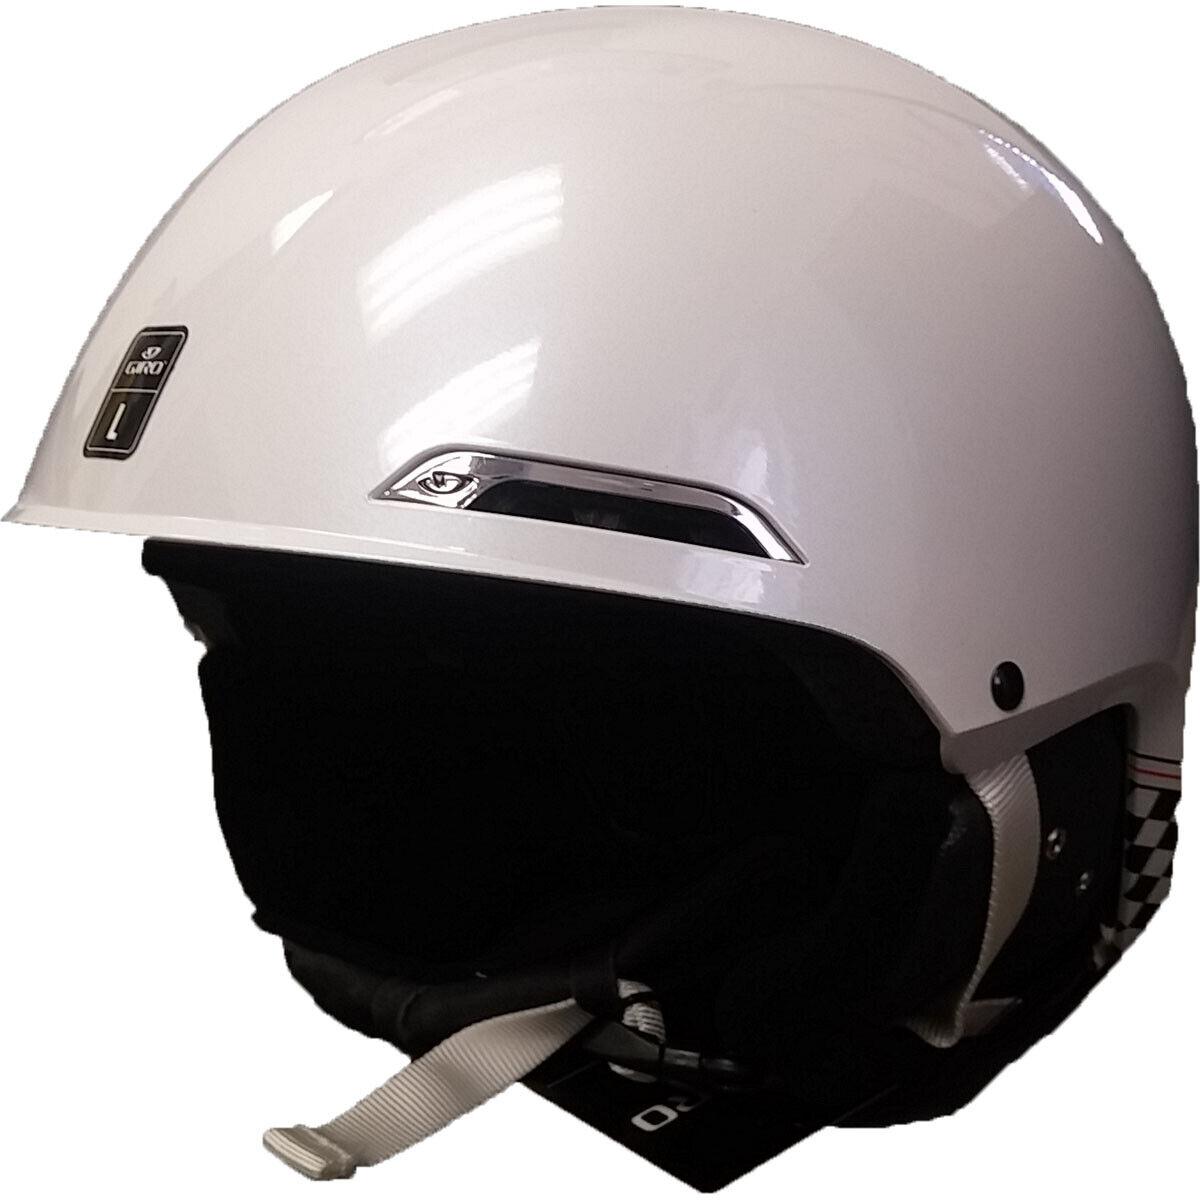 Giro Battle Skiing Snow Sports Helmet White SC Retro Adult Large L 59 62.5 cm